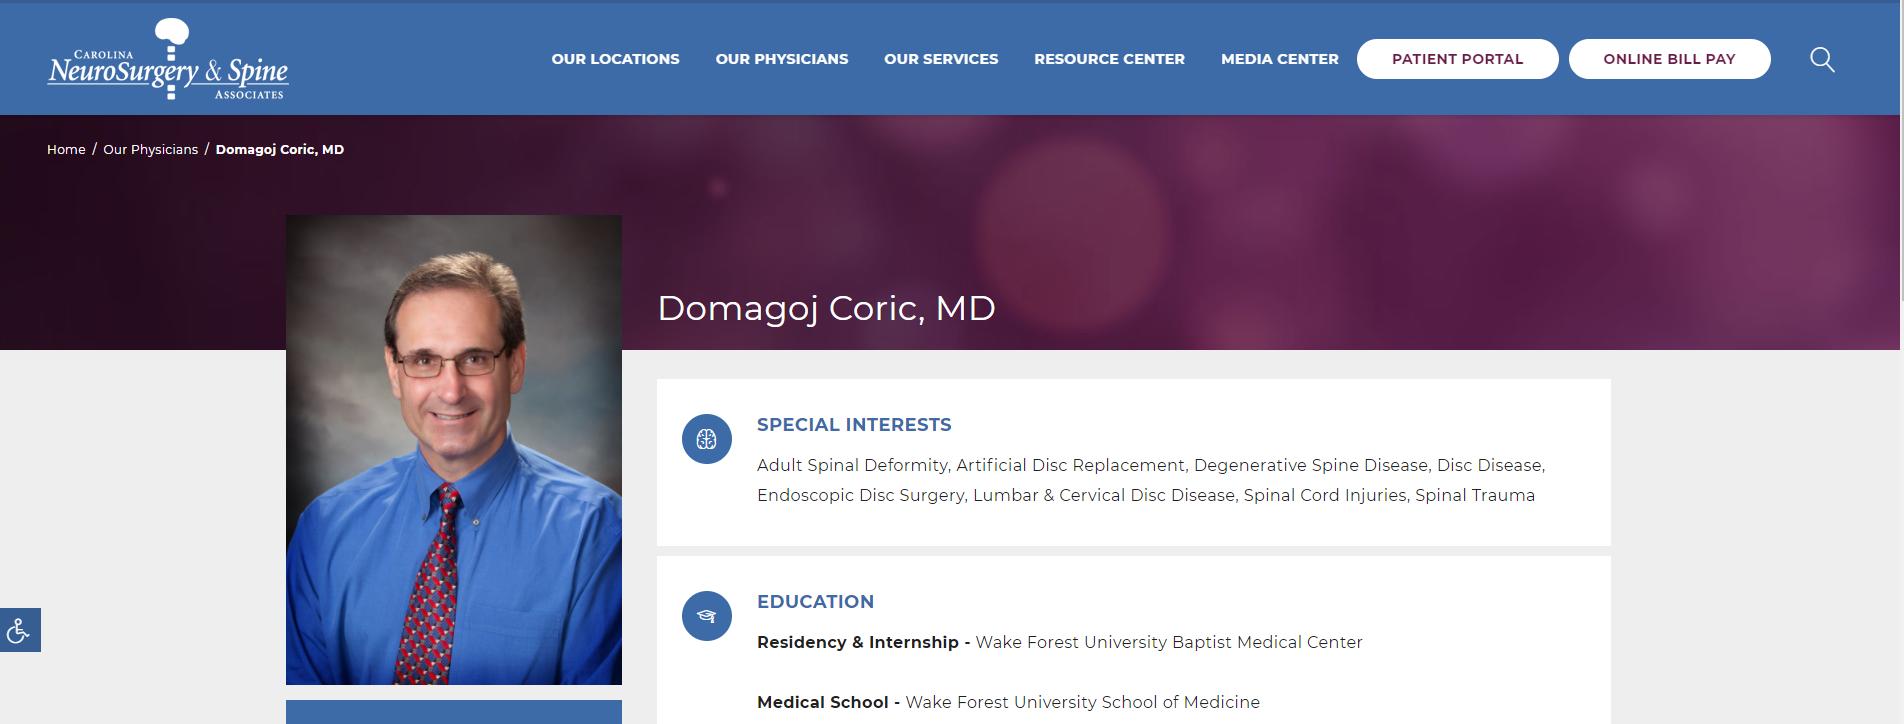 Domagoj Coric, MD